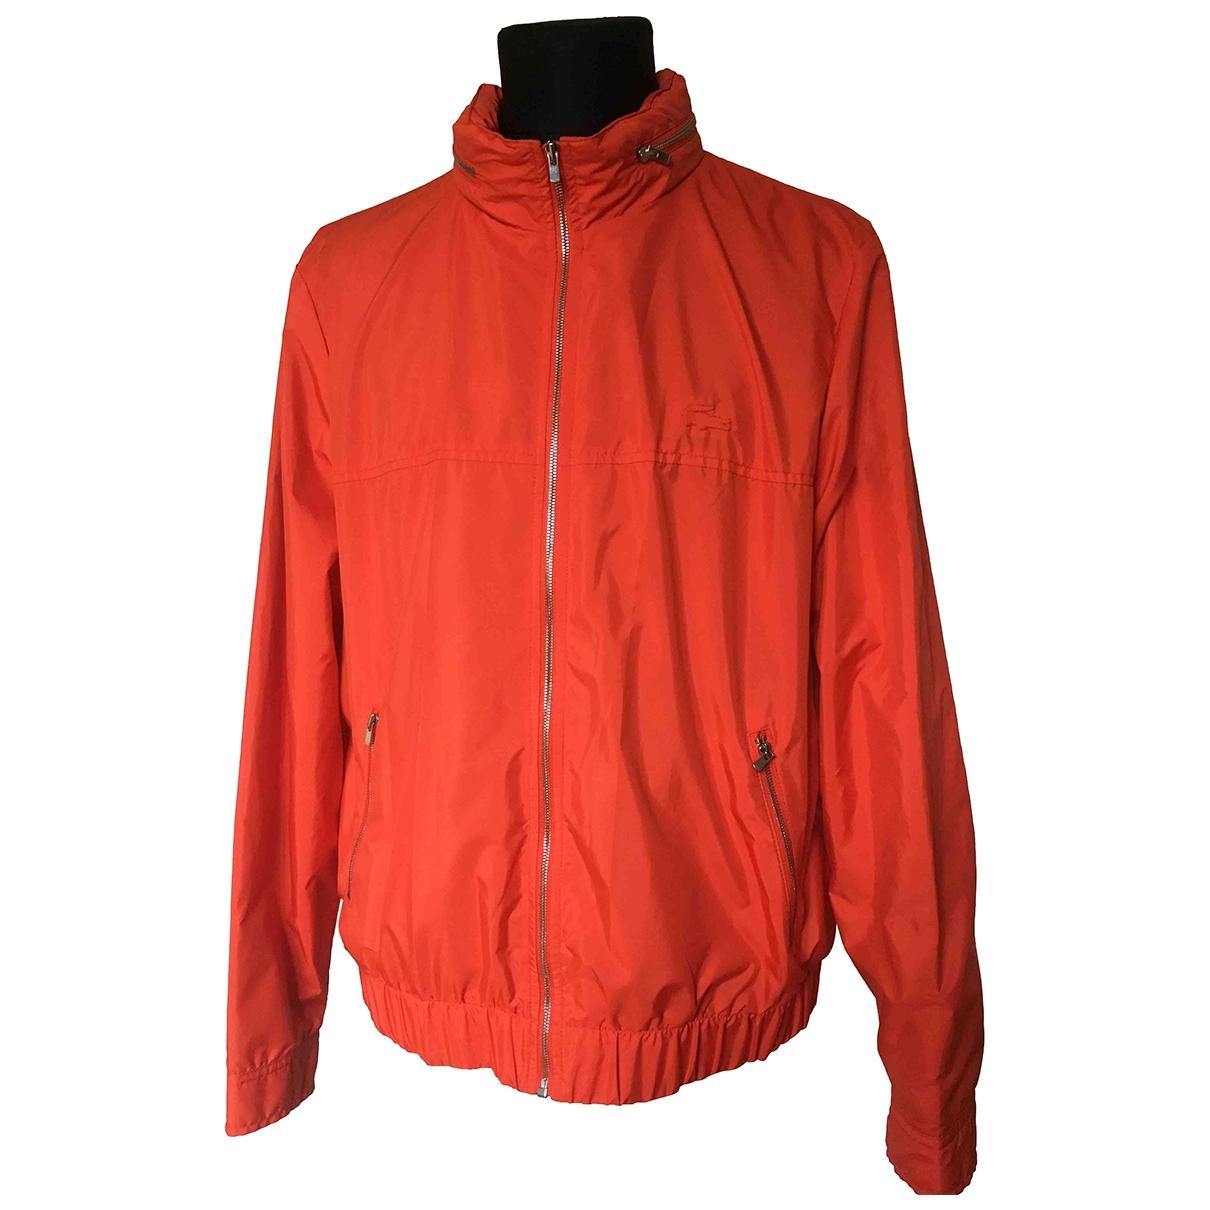 Lacoste \N Lederjacke in  Orange Polyester